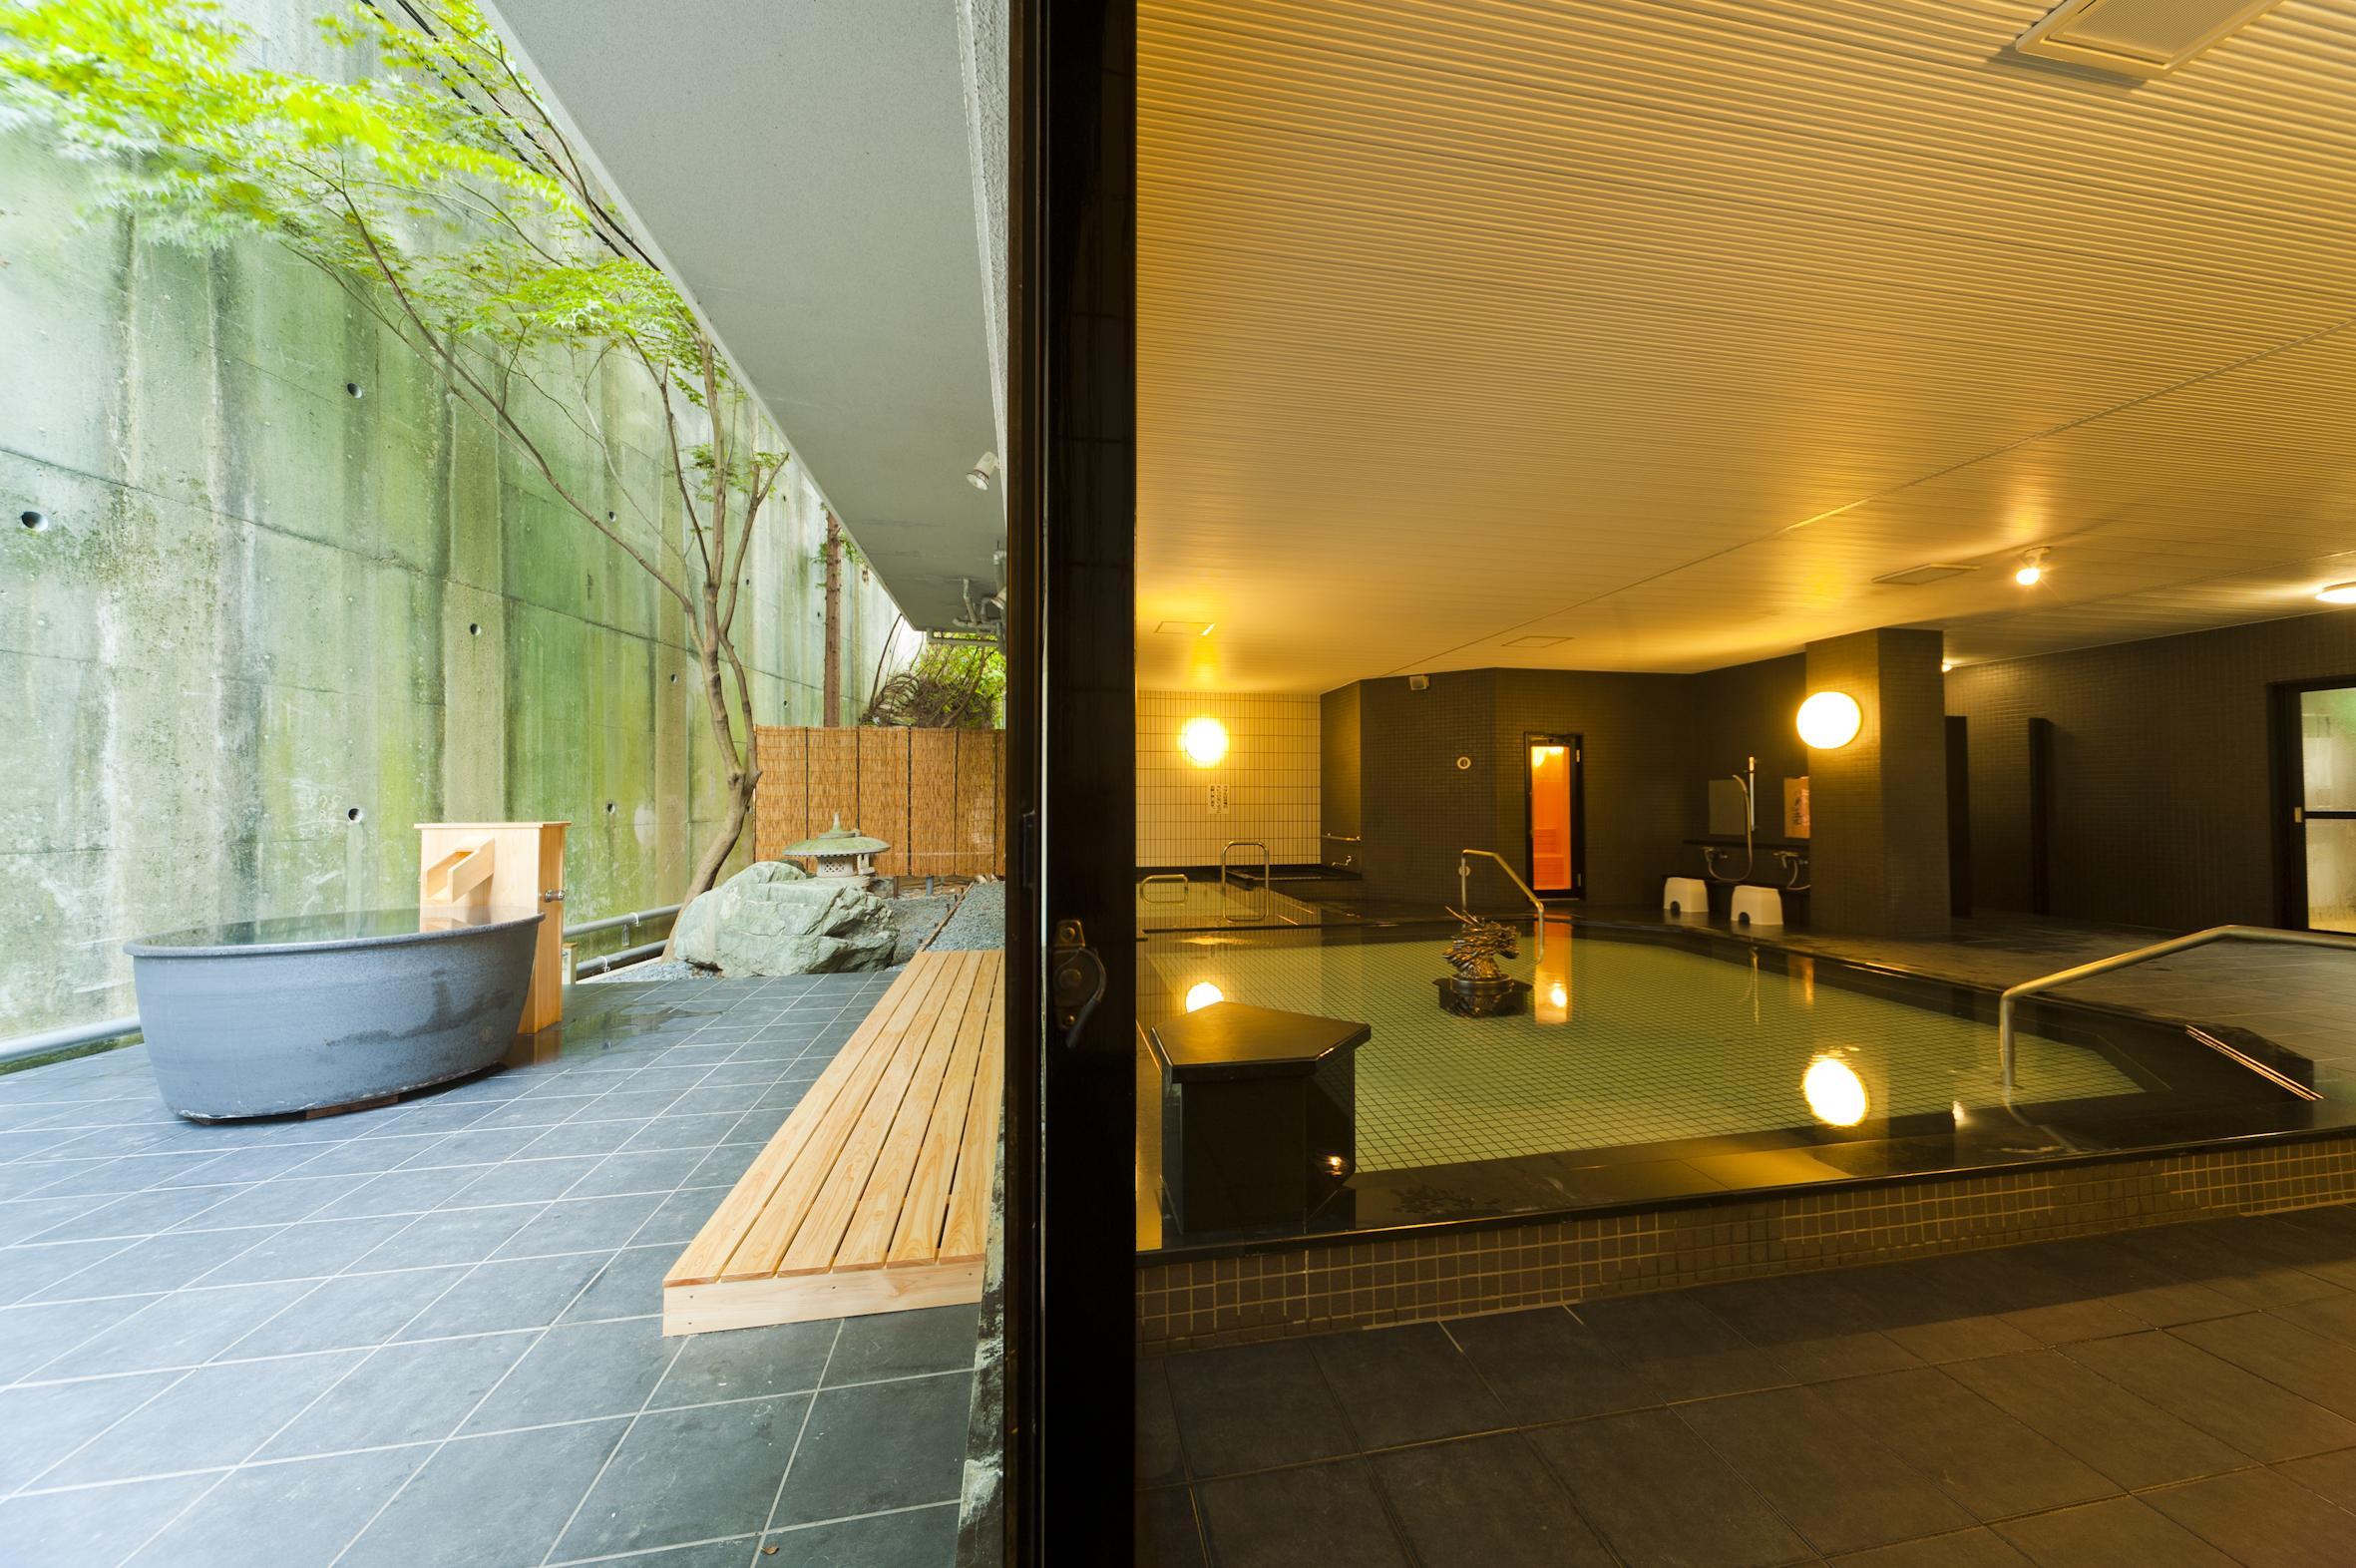 天然温泉 広島北ホテル